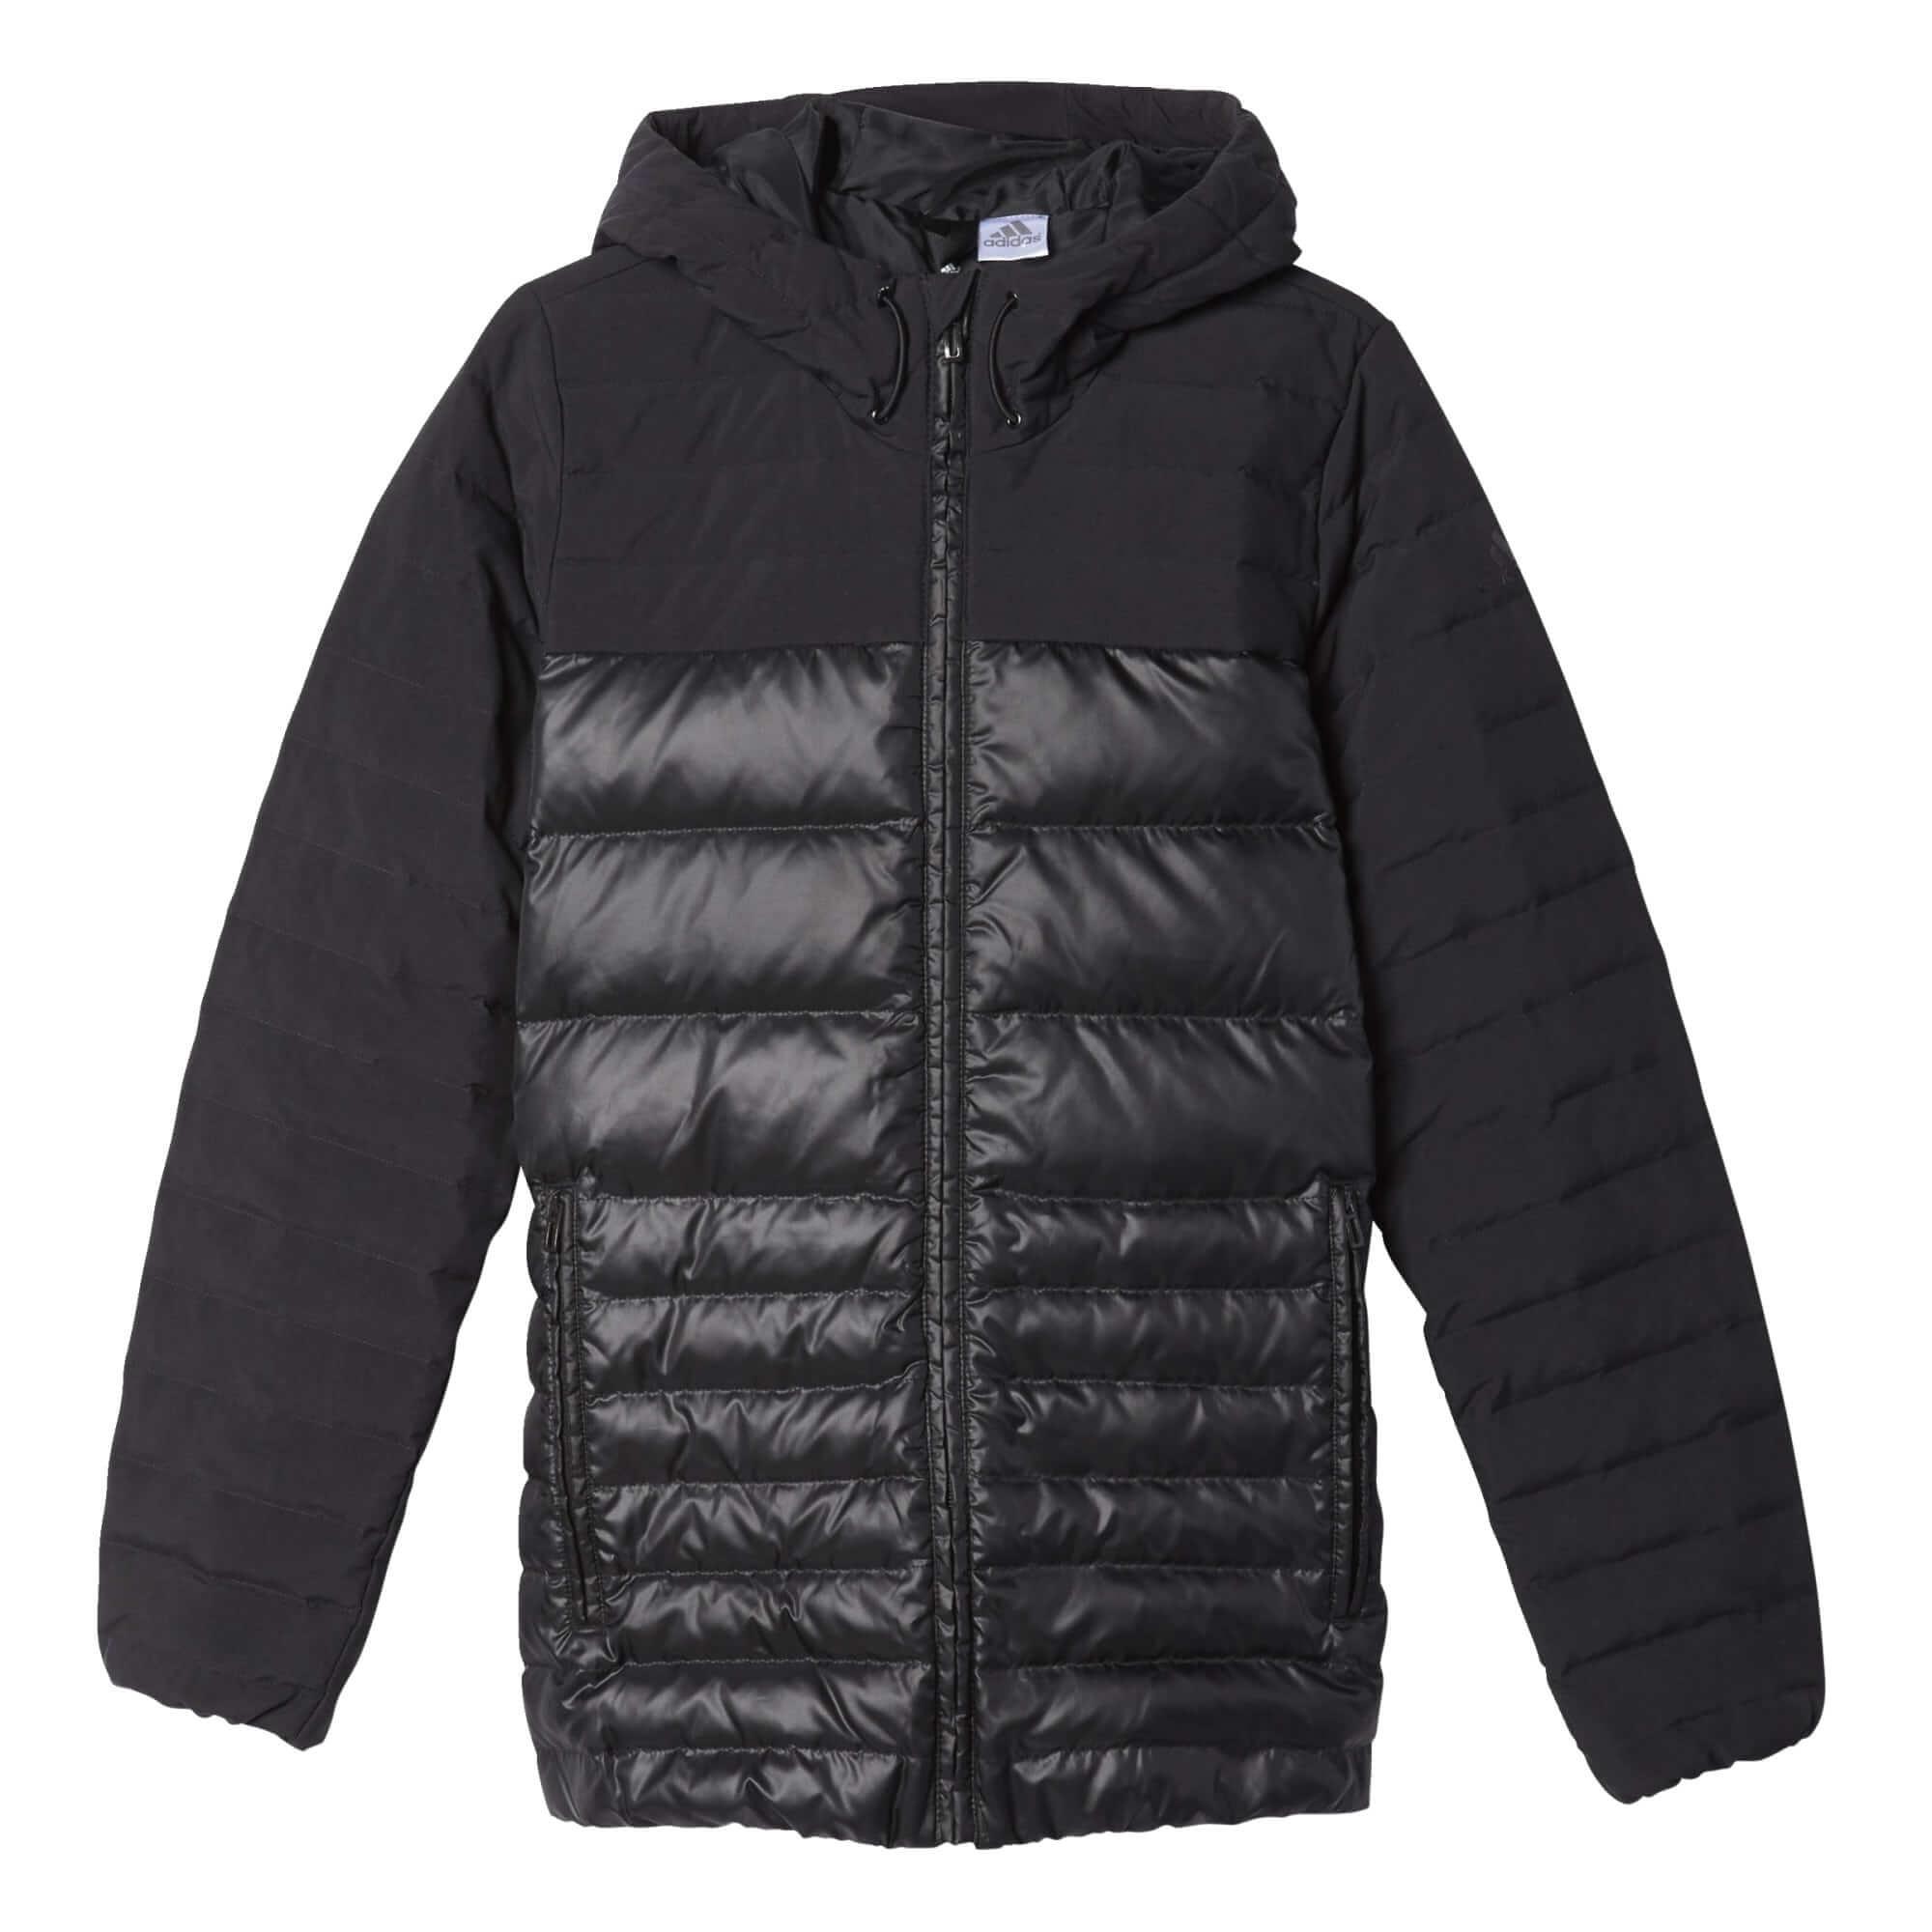 AP8689 Damen adidas Jacket Daunenjacke Down Cozy TF31clKJ